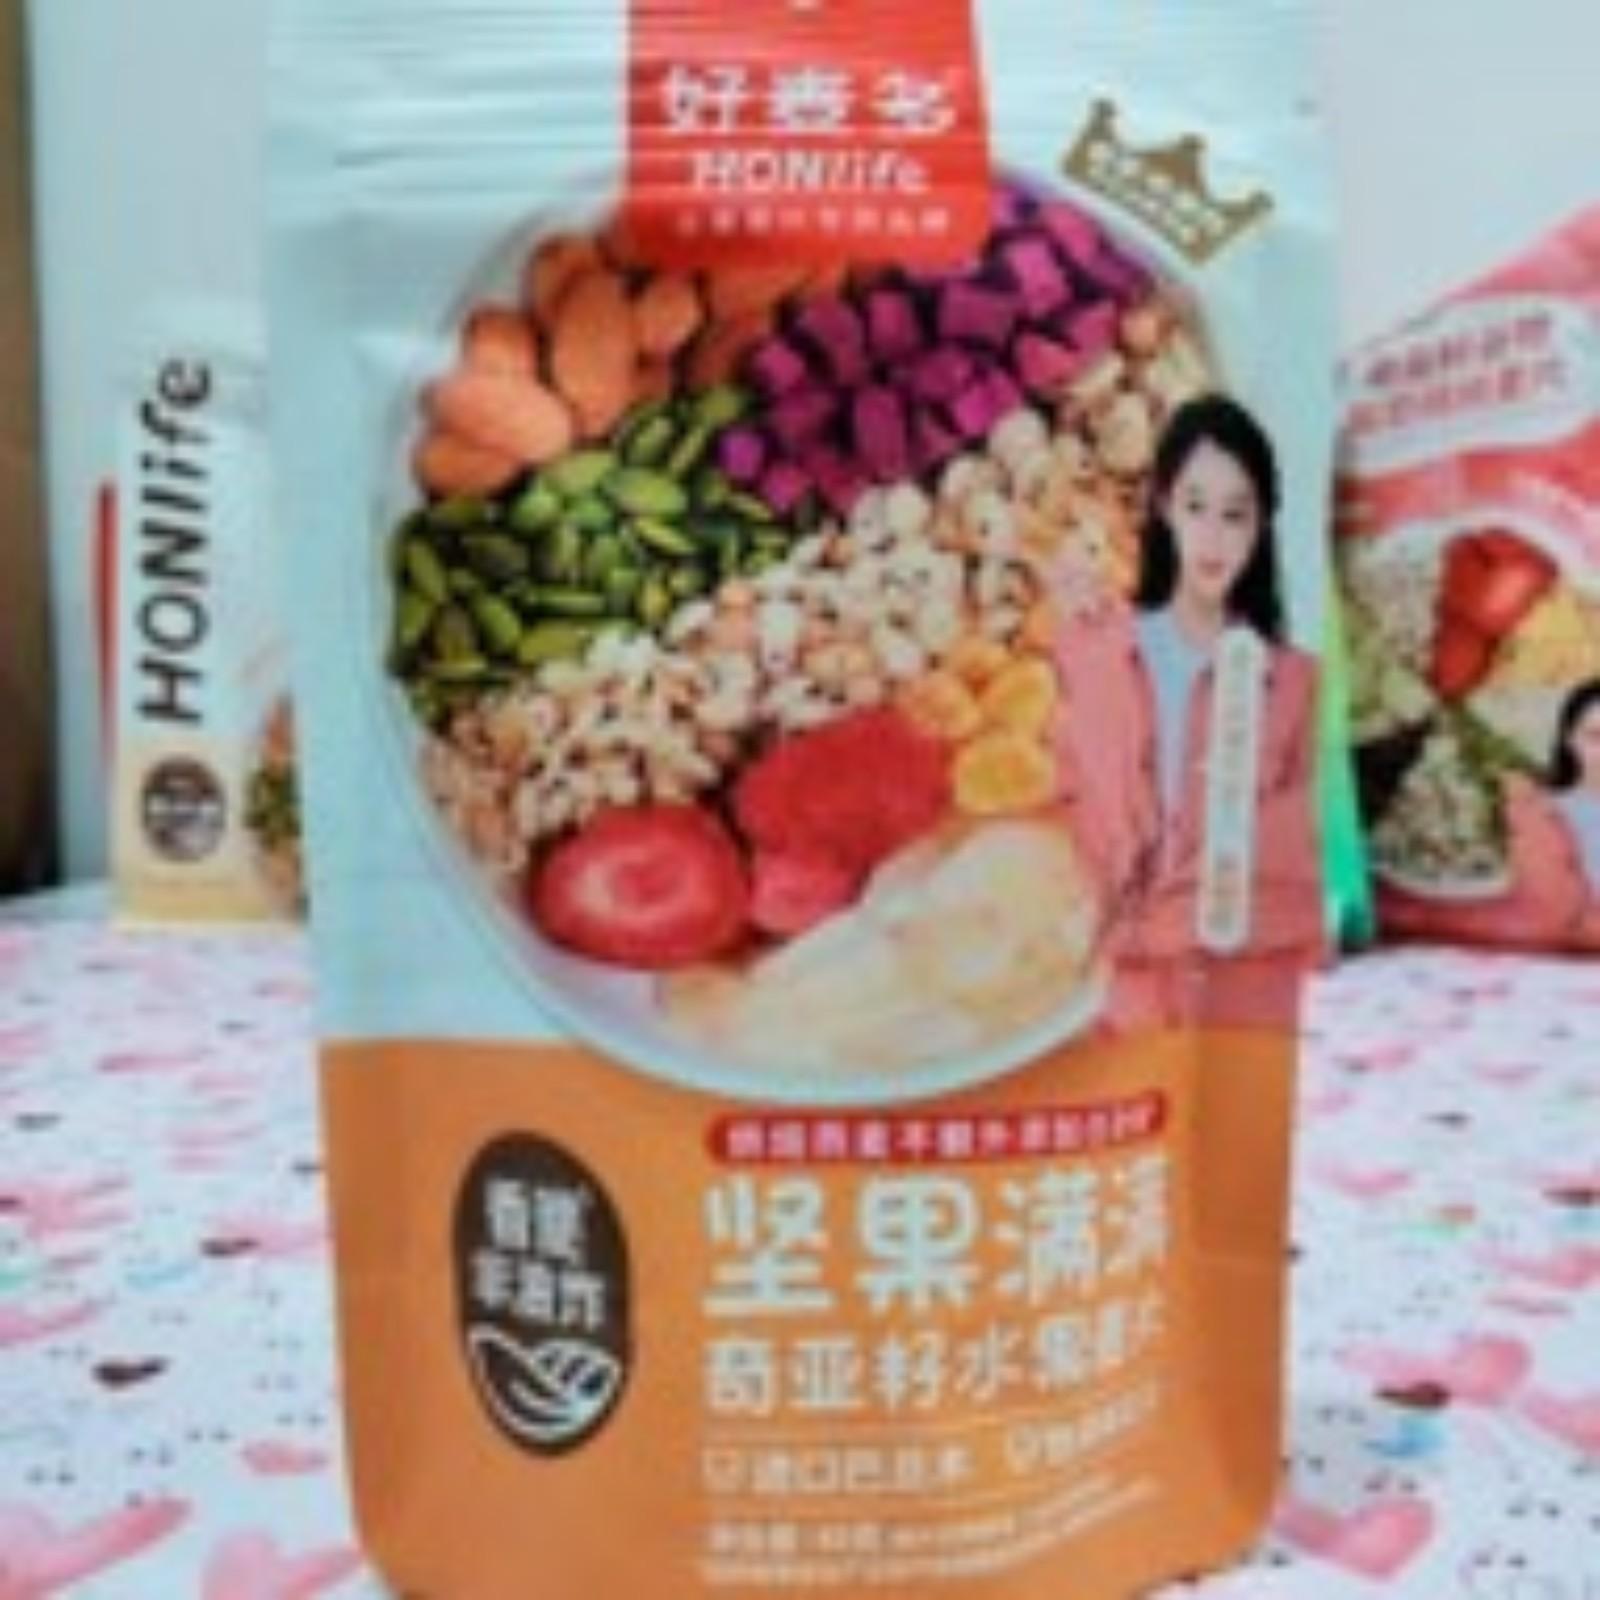 HON LIFE CHIA SEED CEREAL YOGURT(NUTS)GRANOLA 40G 坚果满满 奇亚籽水果麦片